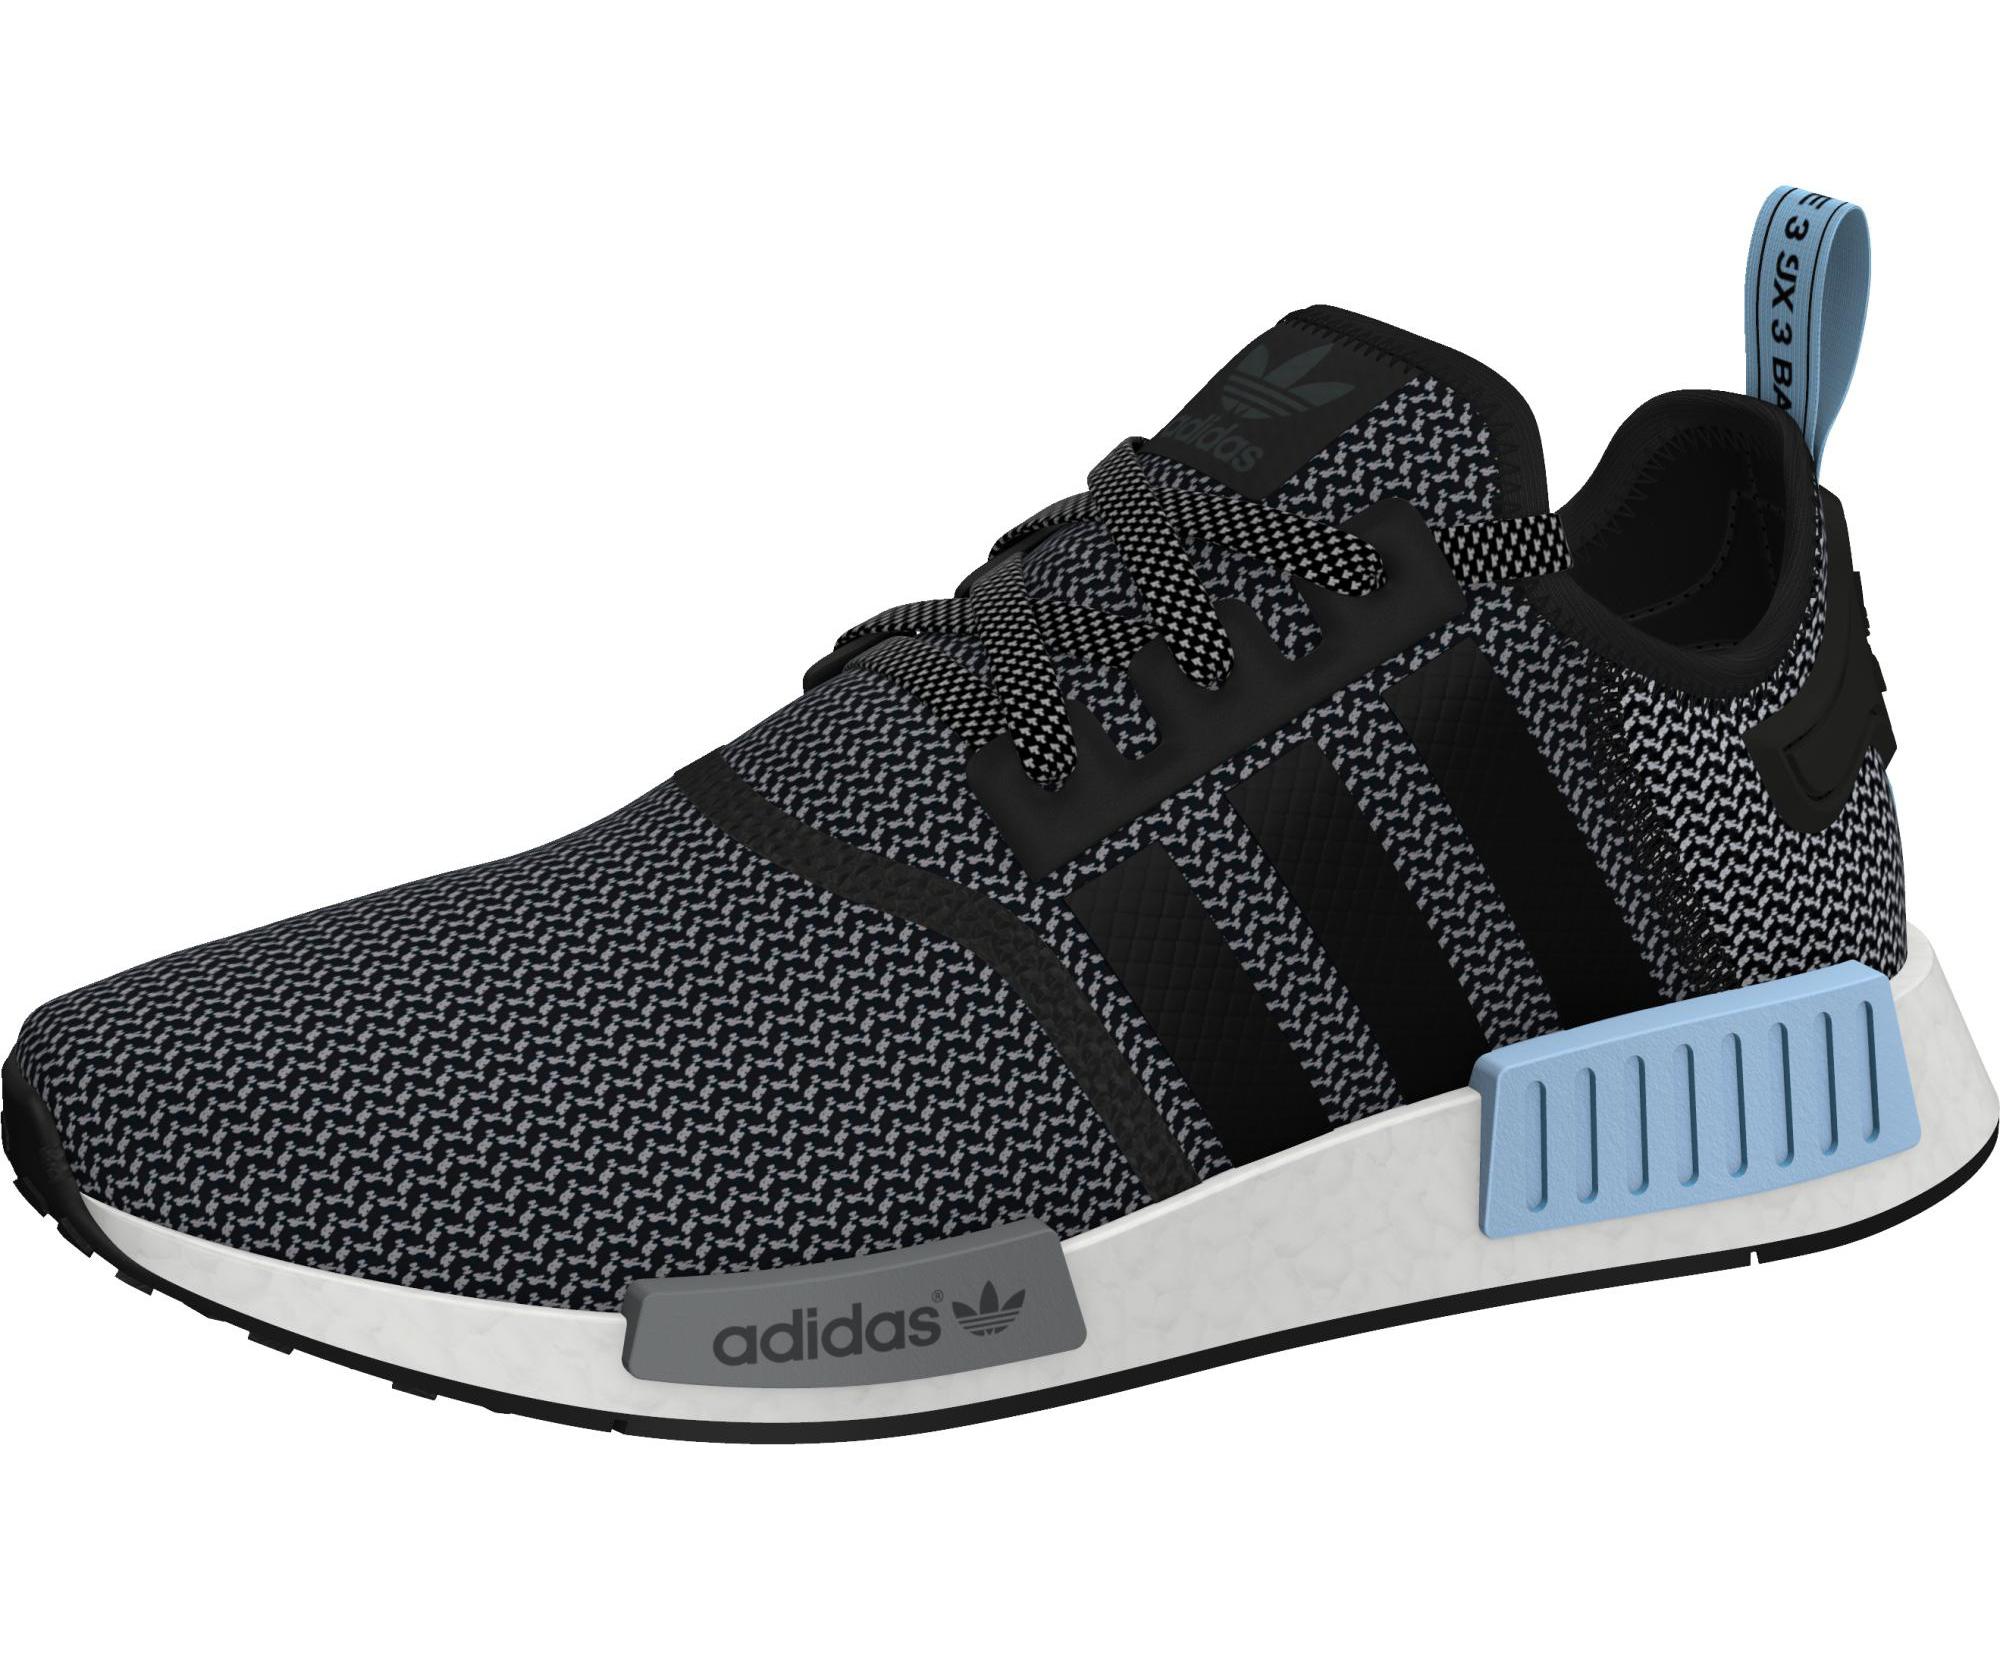 online store bffb4 a8ec7 Chaussures Adidas Nmd Homme En Ligne Tea308